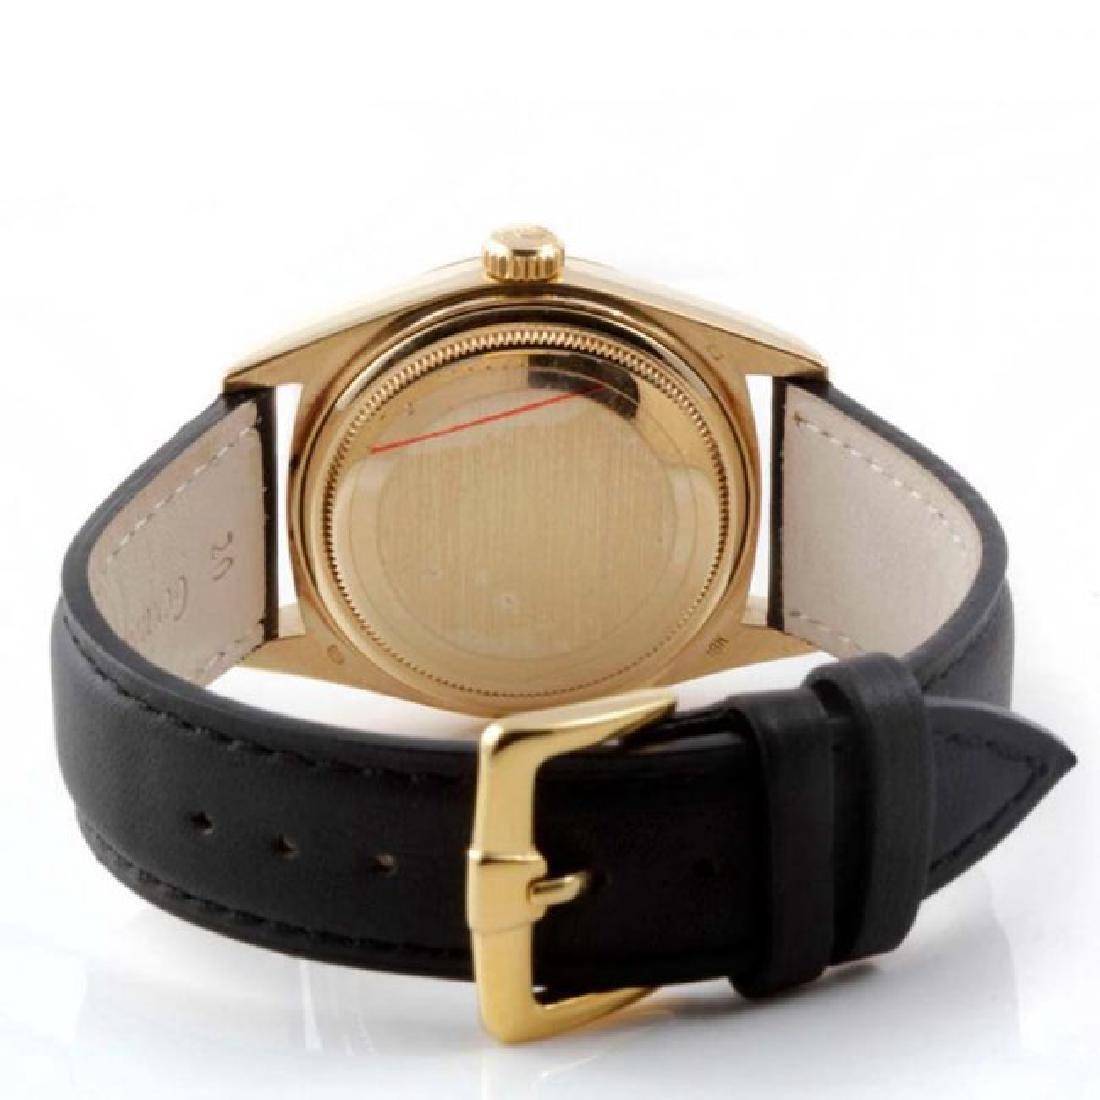 Rolex Men's 18K President Black Dial Watch - 3